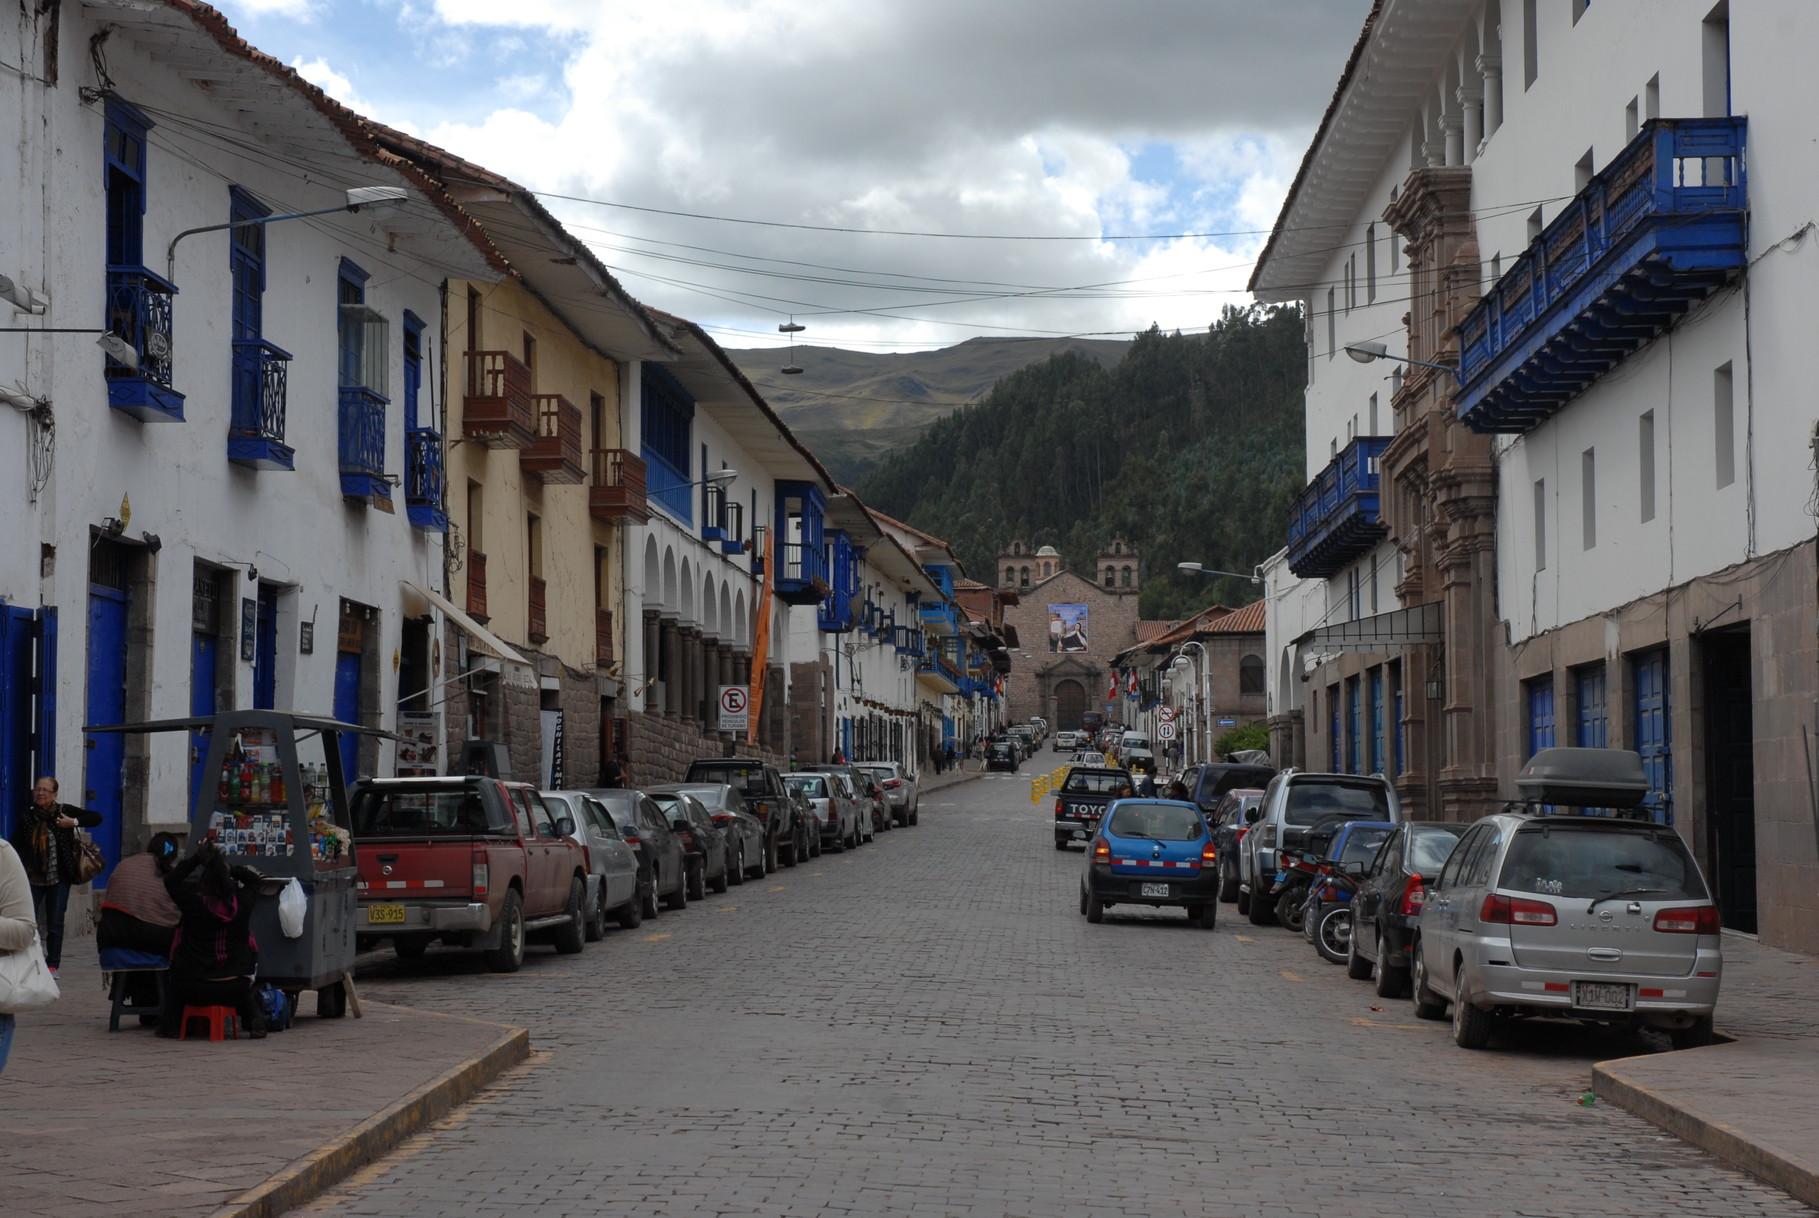 Nette Straßen mit alten Kolonialhäusern in Cusco